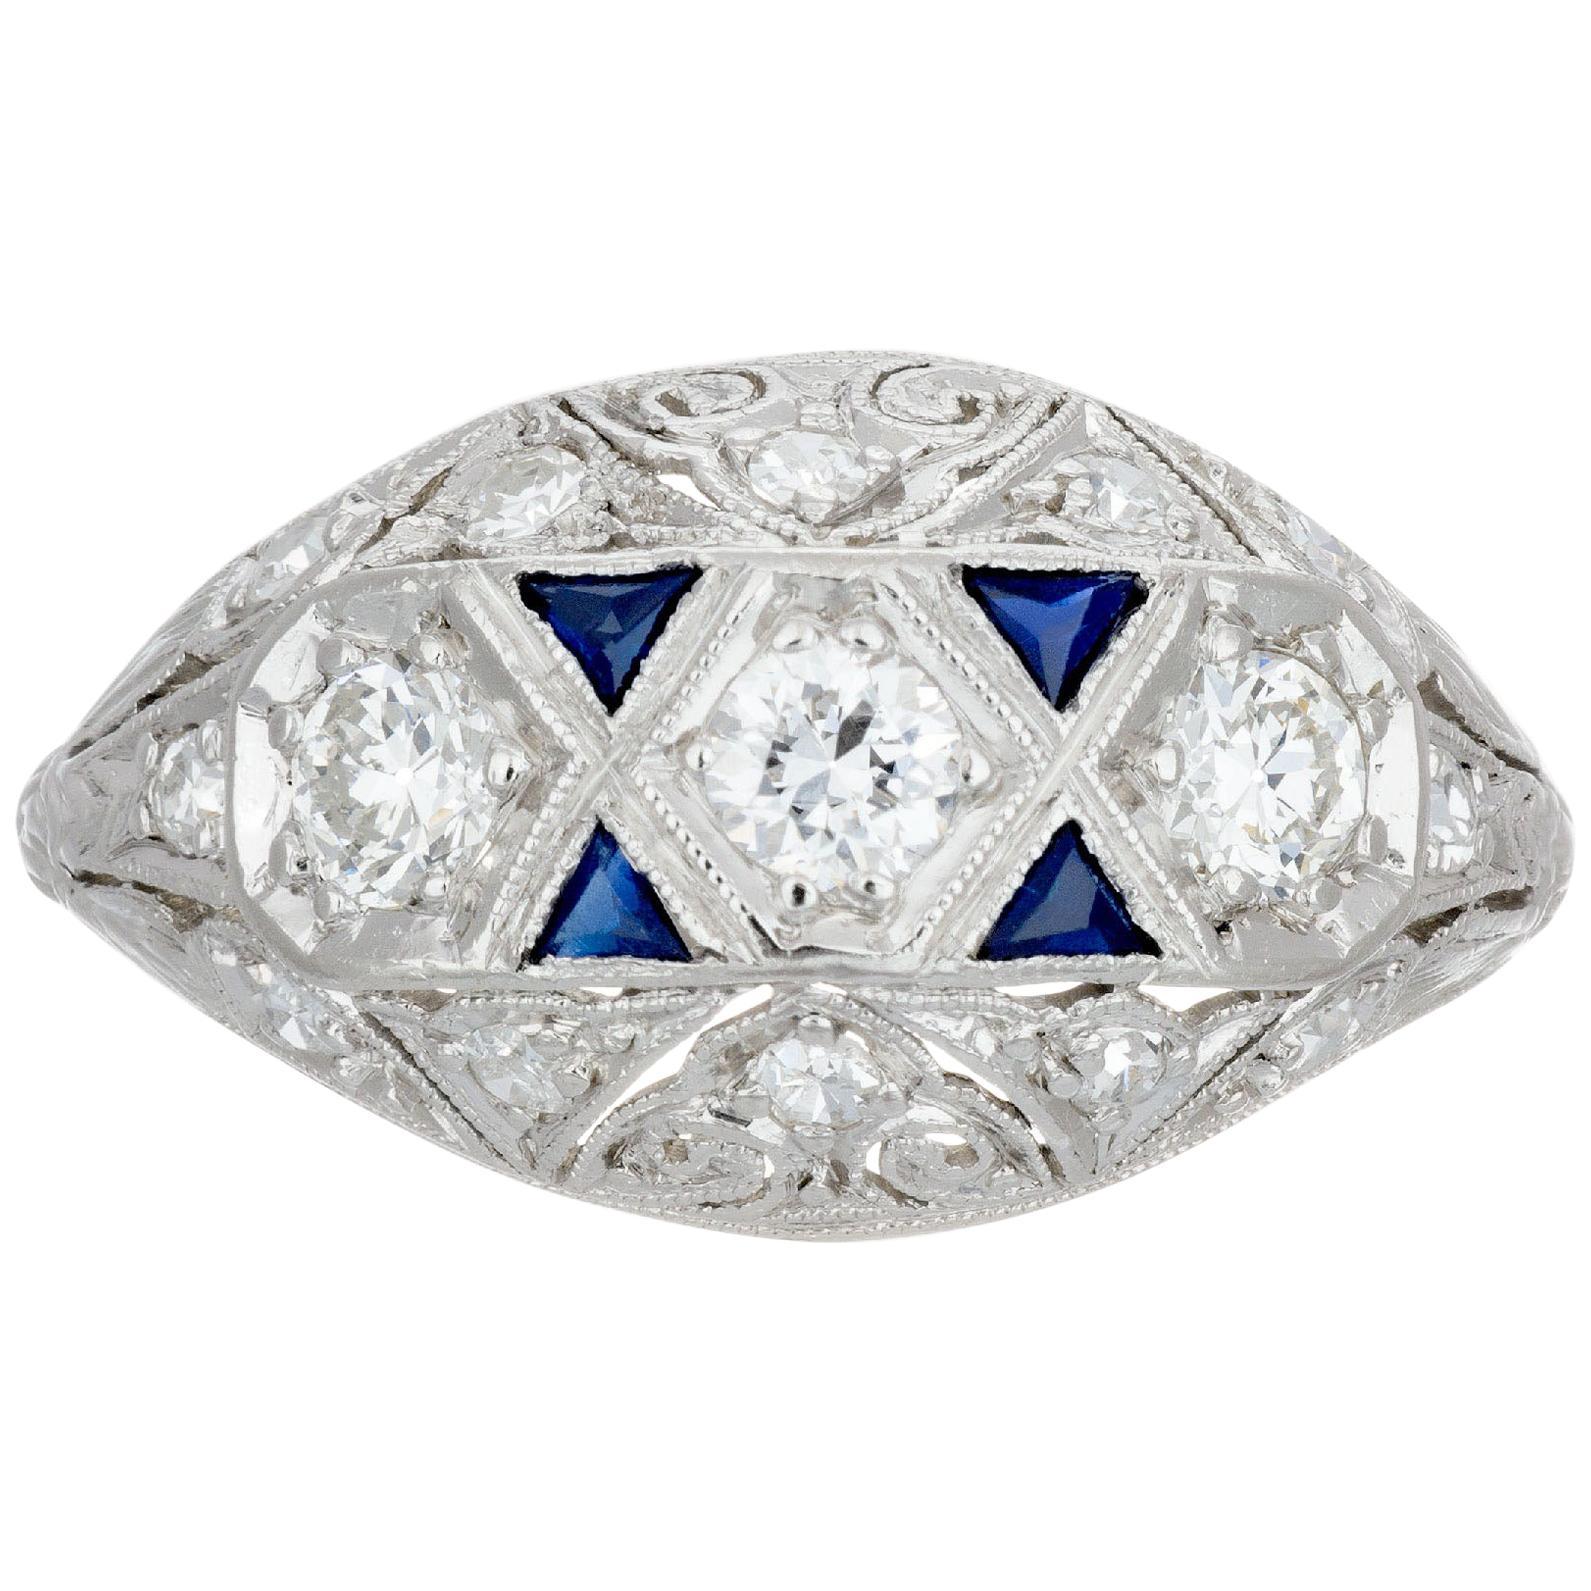 .75 Carat Old European Diamond Sapphire Art Deco Platinum Dome Engagement Ring